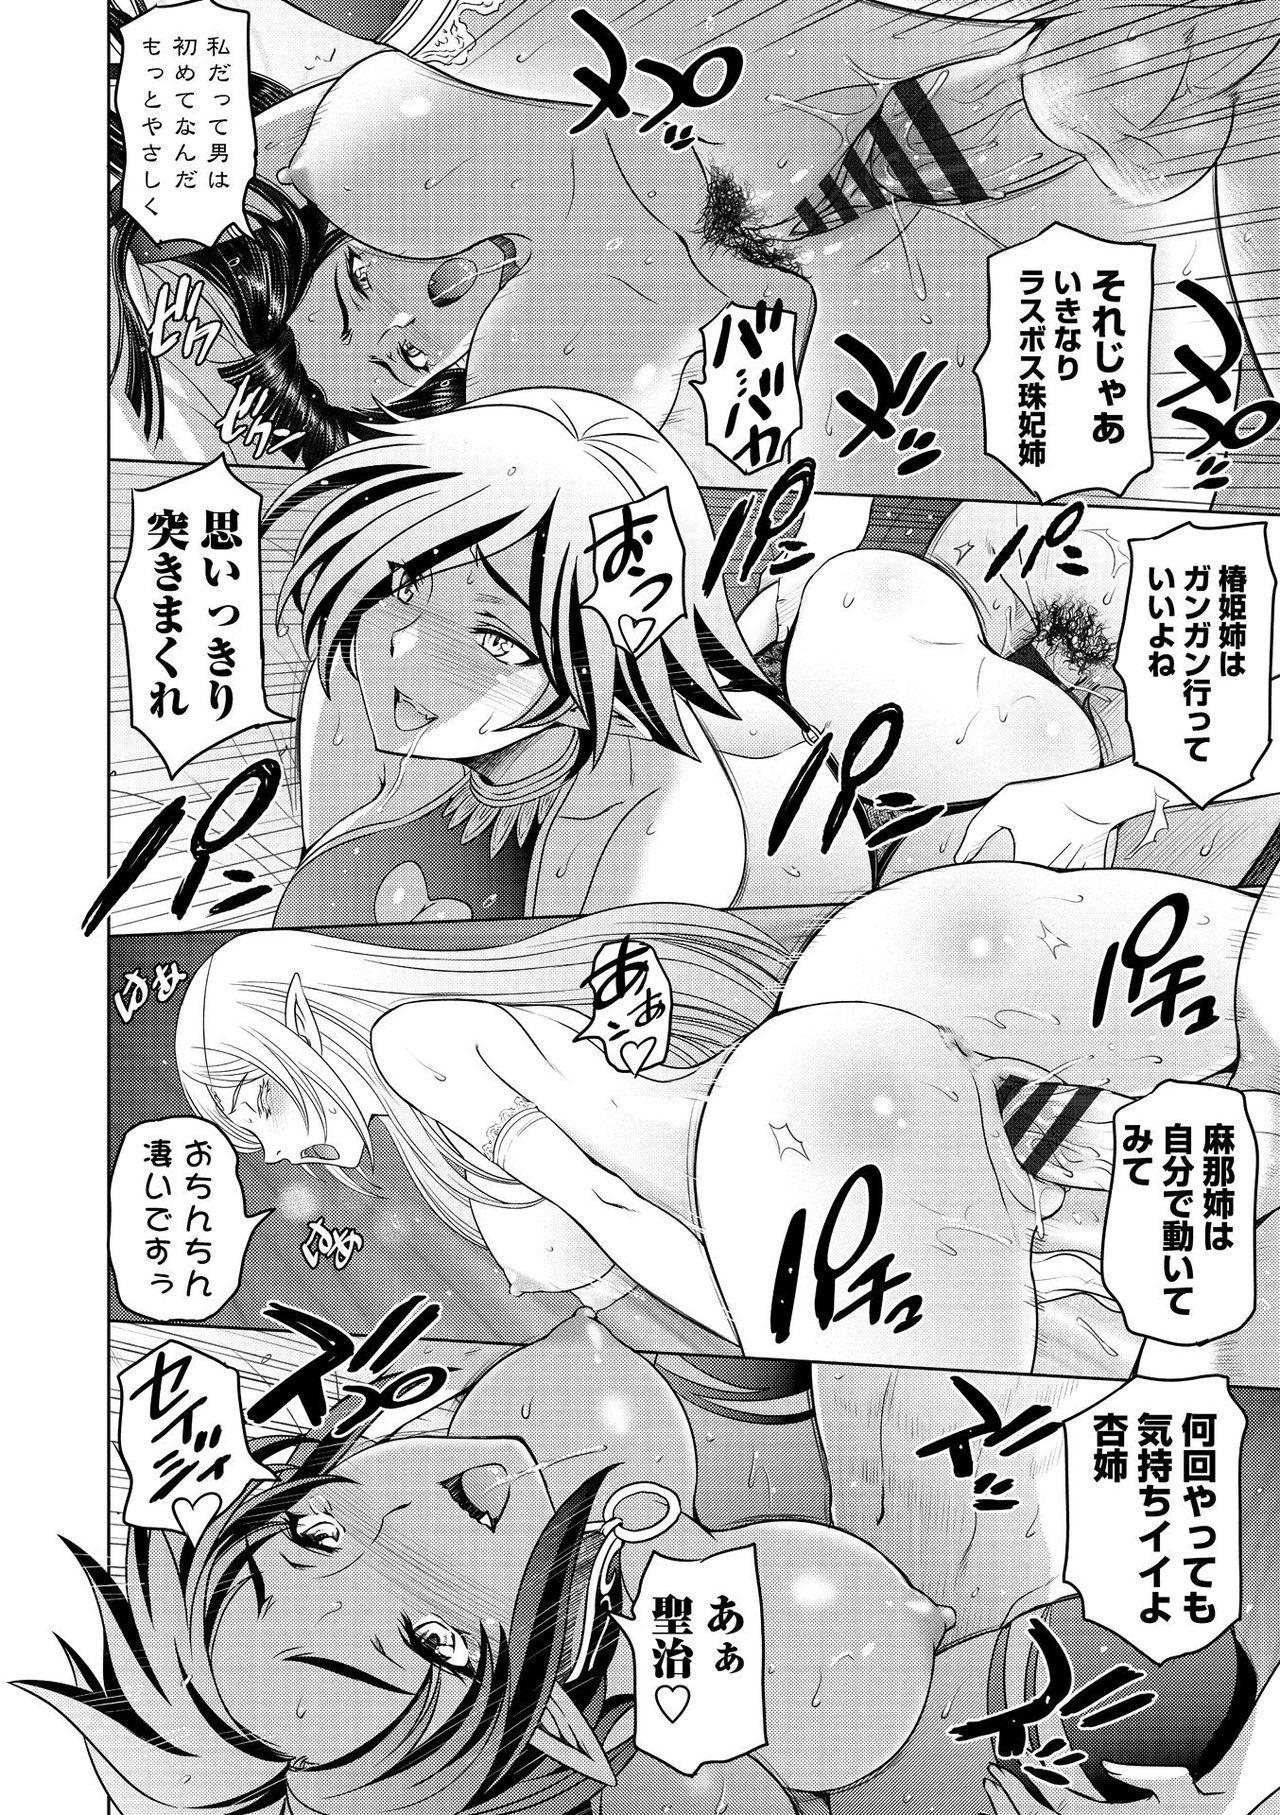 Dosukebe Onei-chan 203